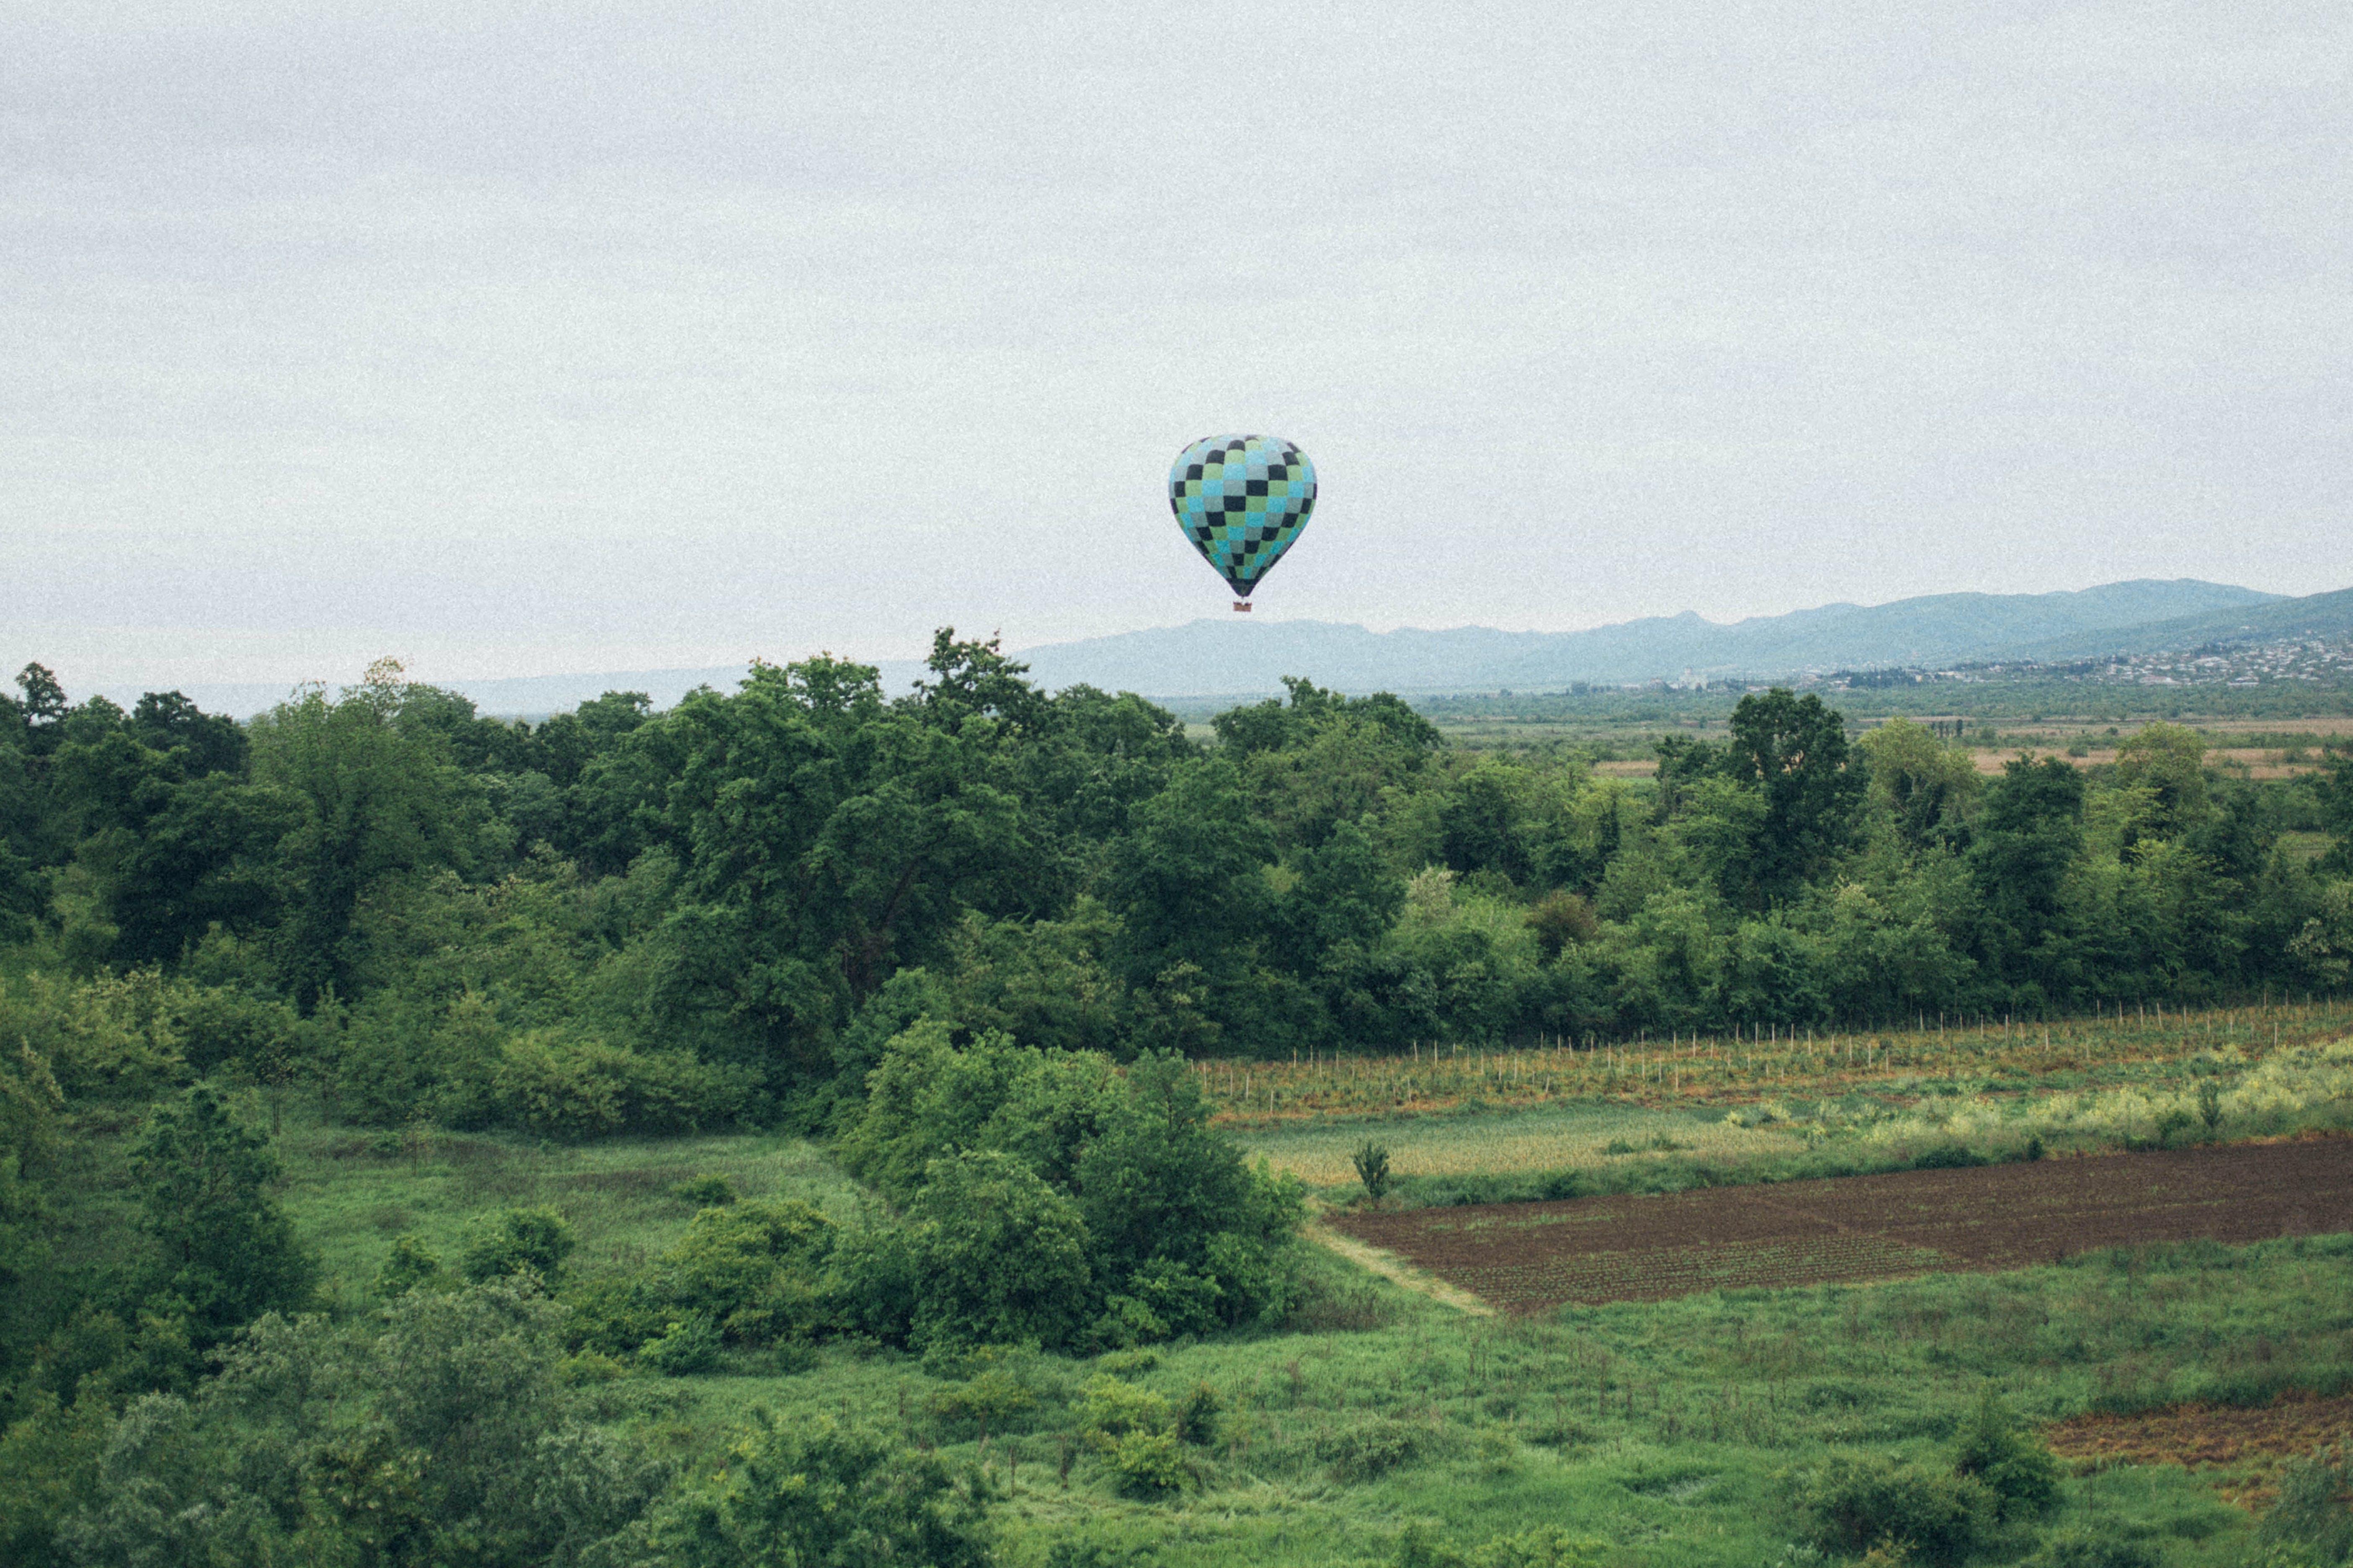 Hot-air Balloon over Green Trees